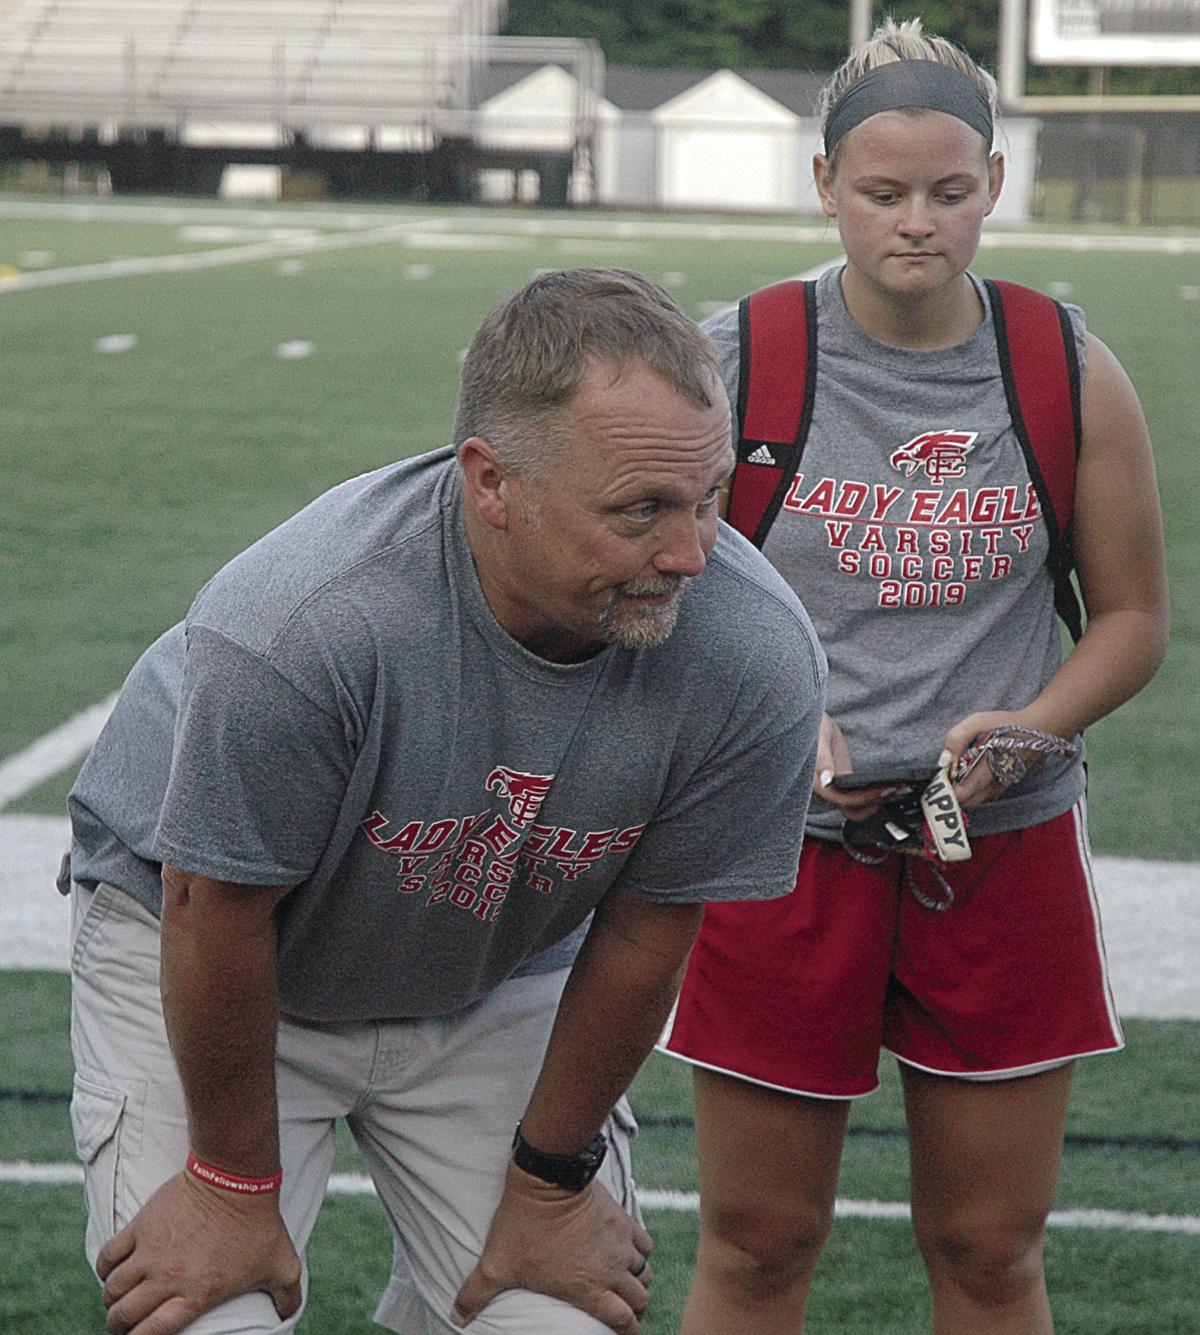 Jordan, Potter reap top Piedmont District girls soccer honors